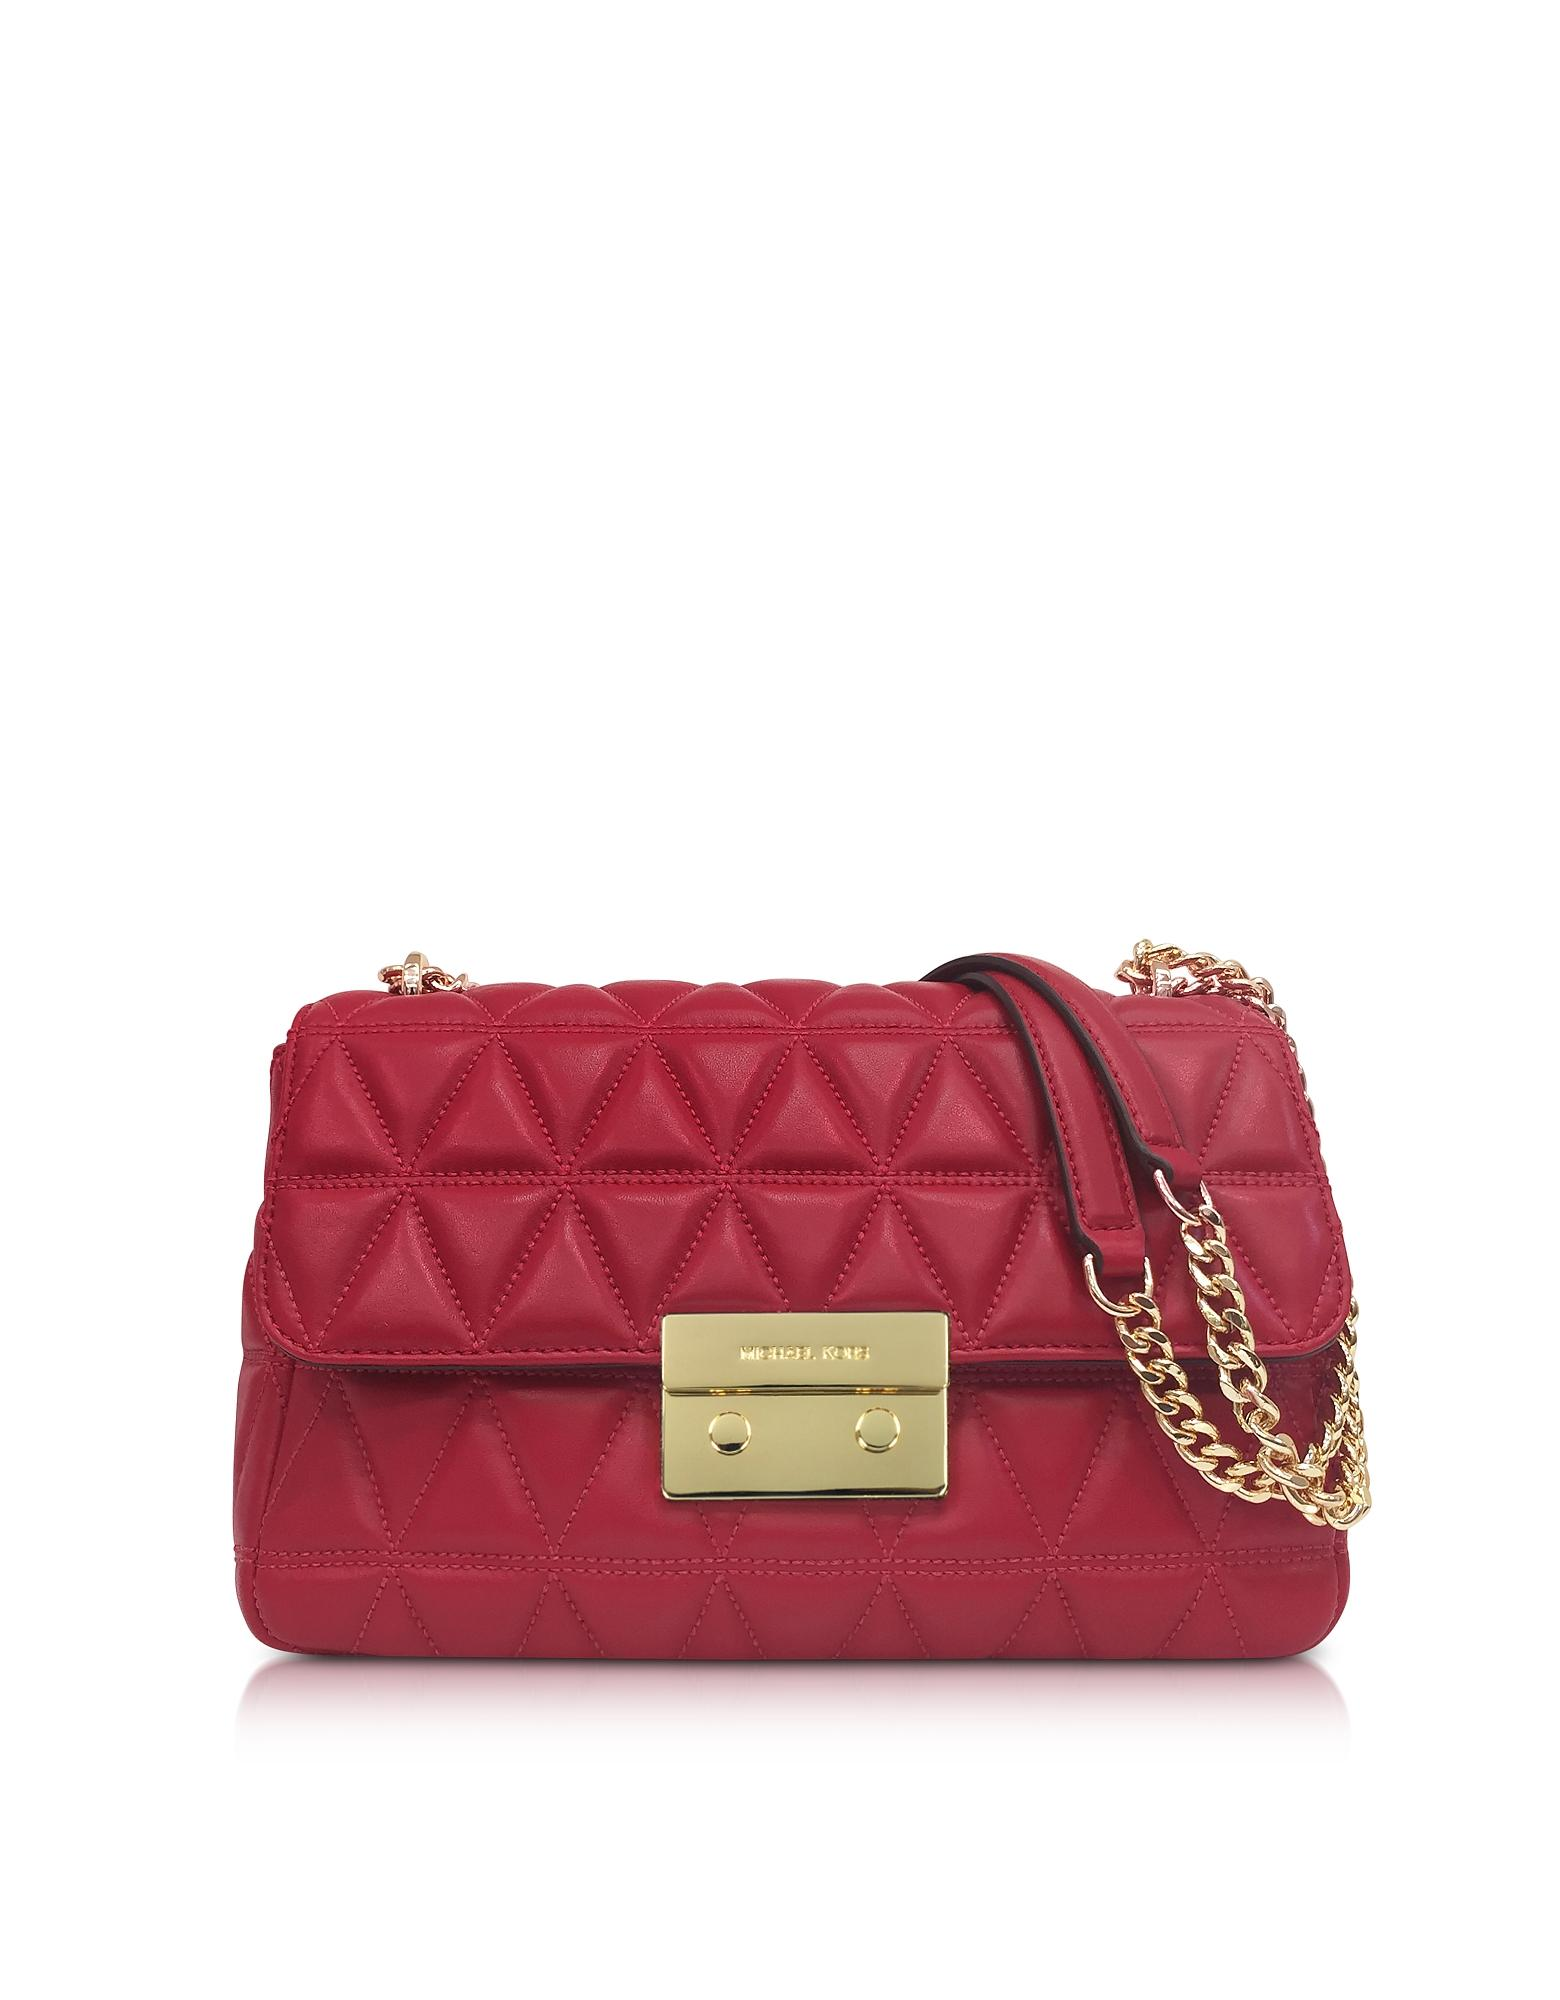 7bdf2e68648d6 Michael Kors Bright Red Sloan Large Quilted-Leather Shoulder Bag ...